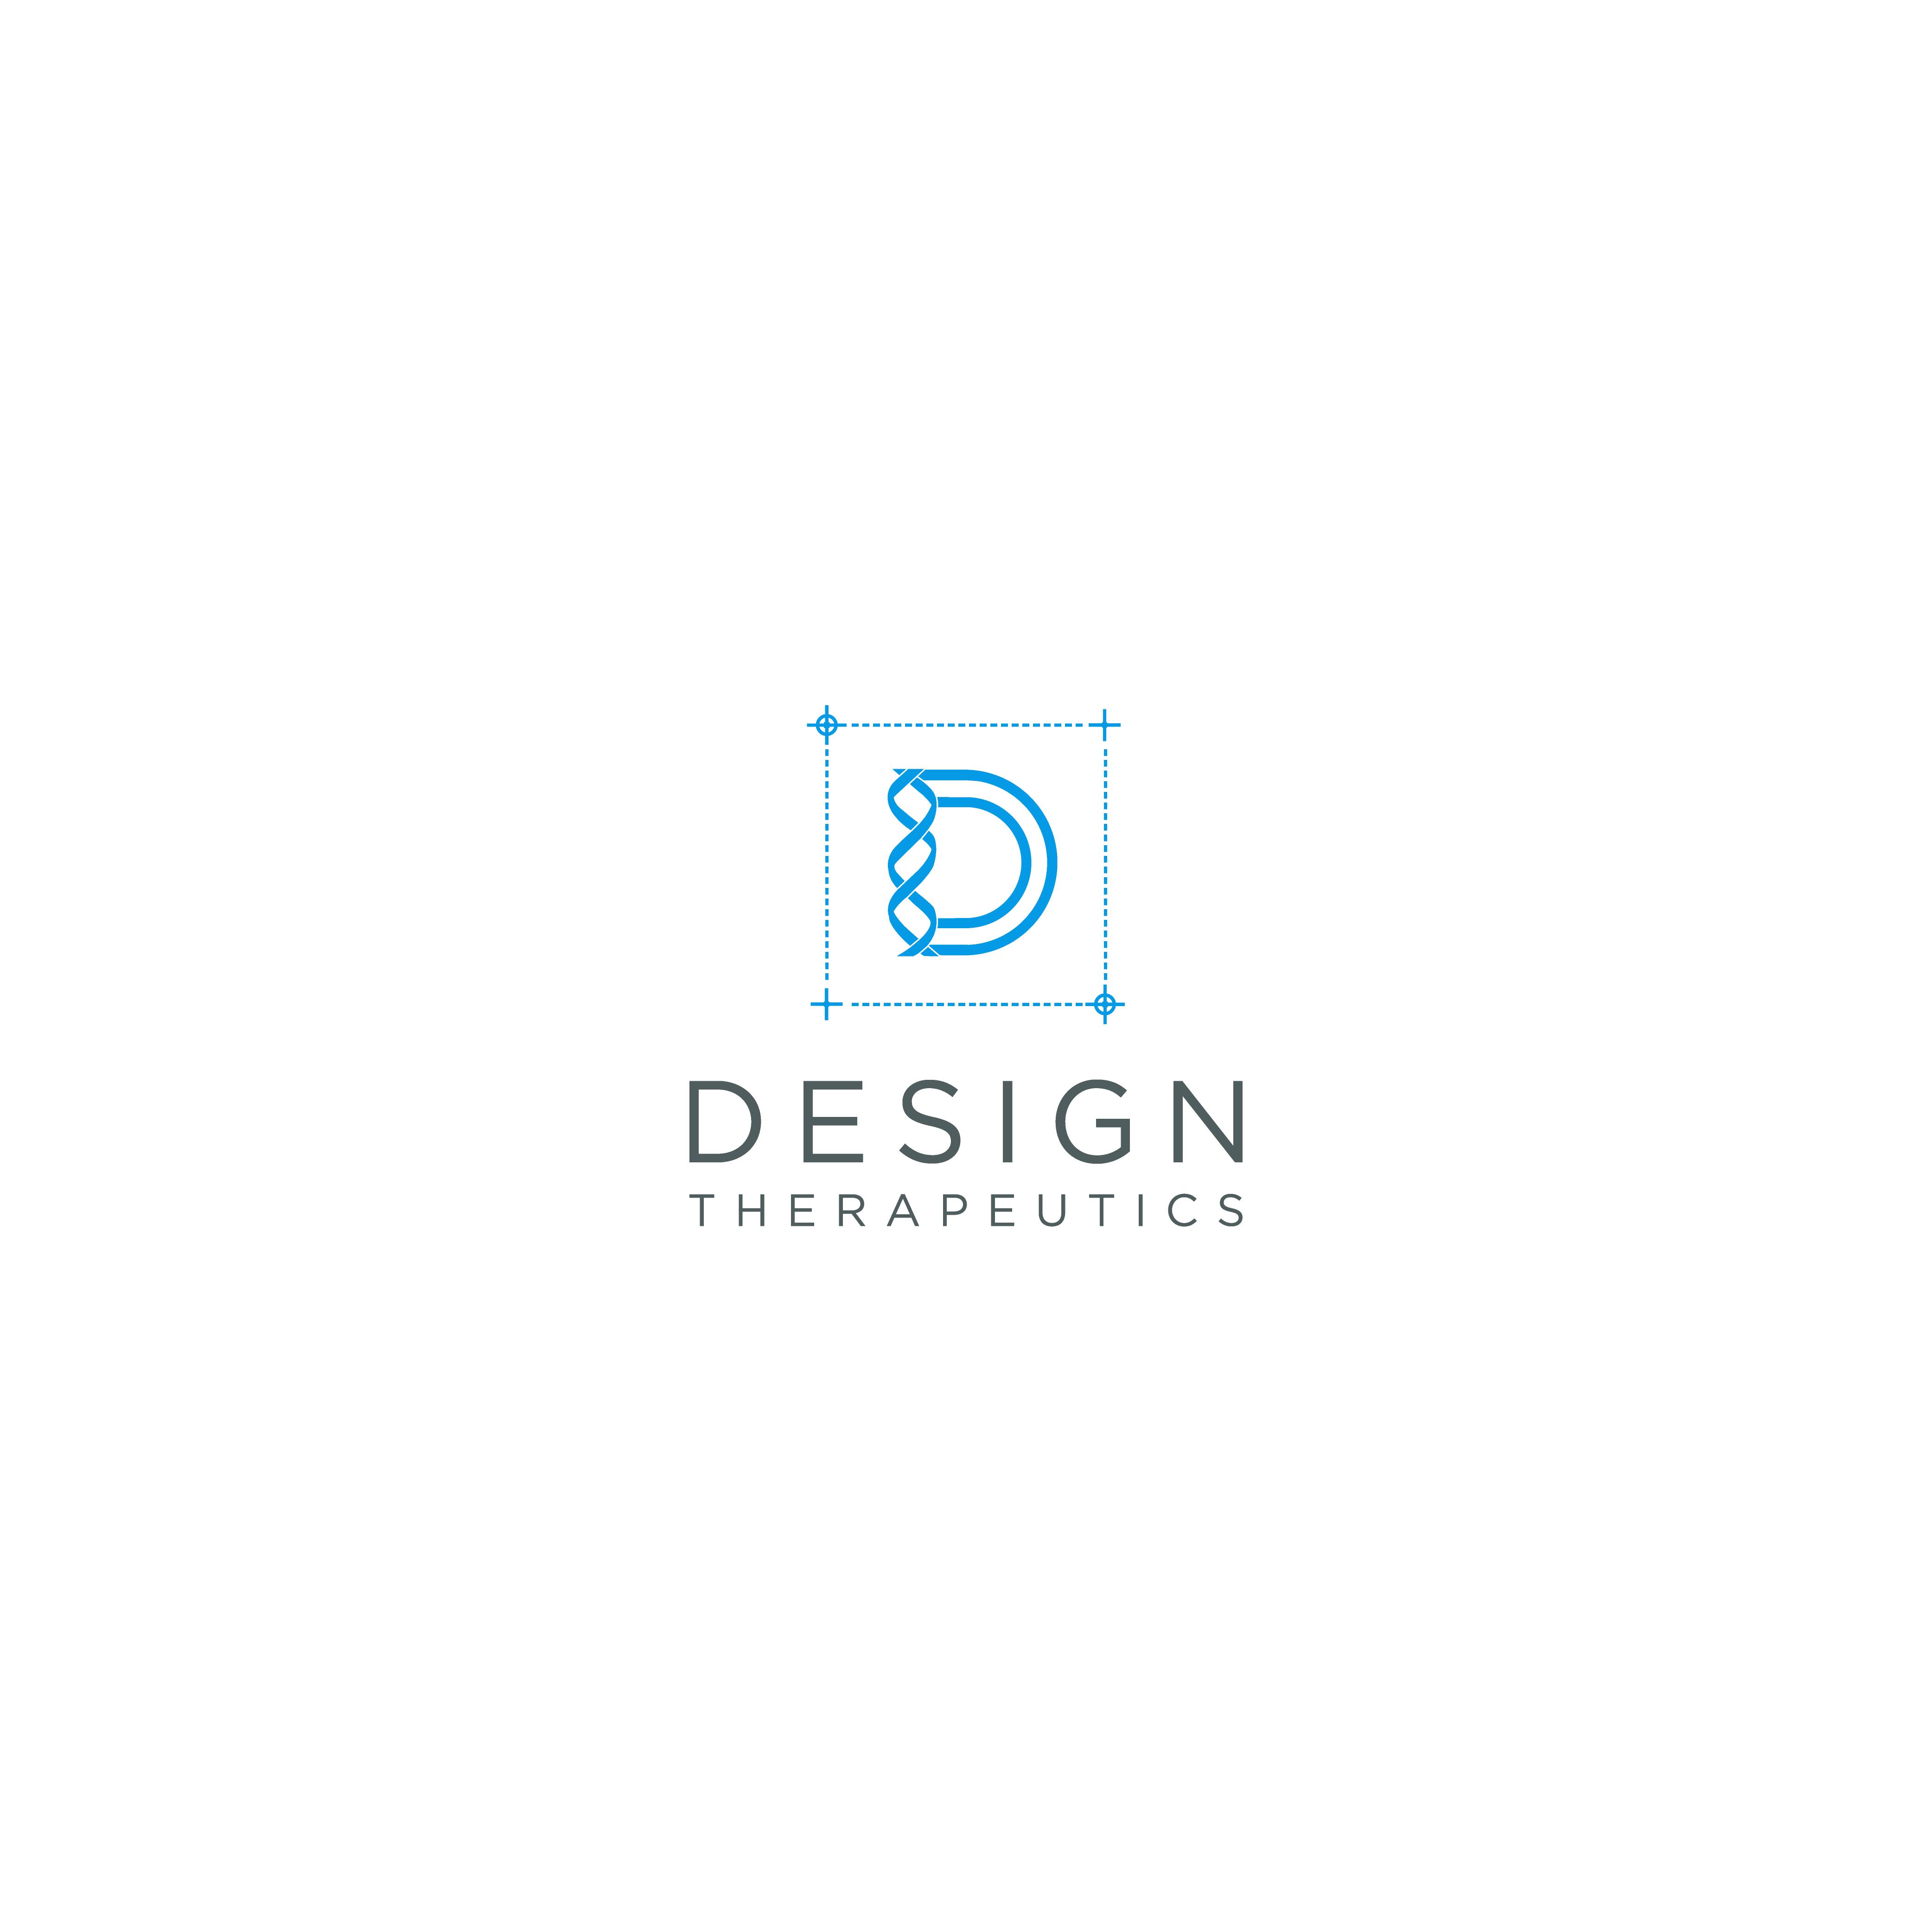 Modern logo for a biotech company focused around design concepts